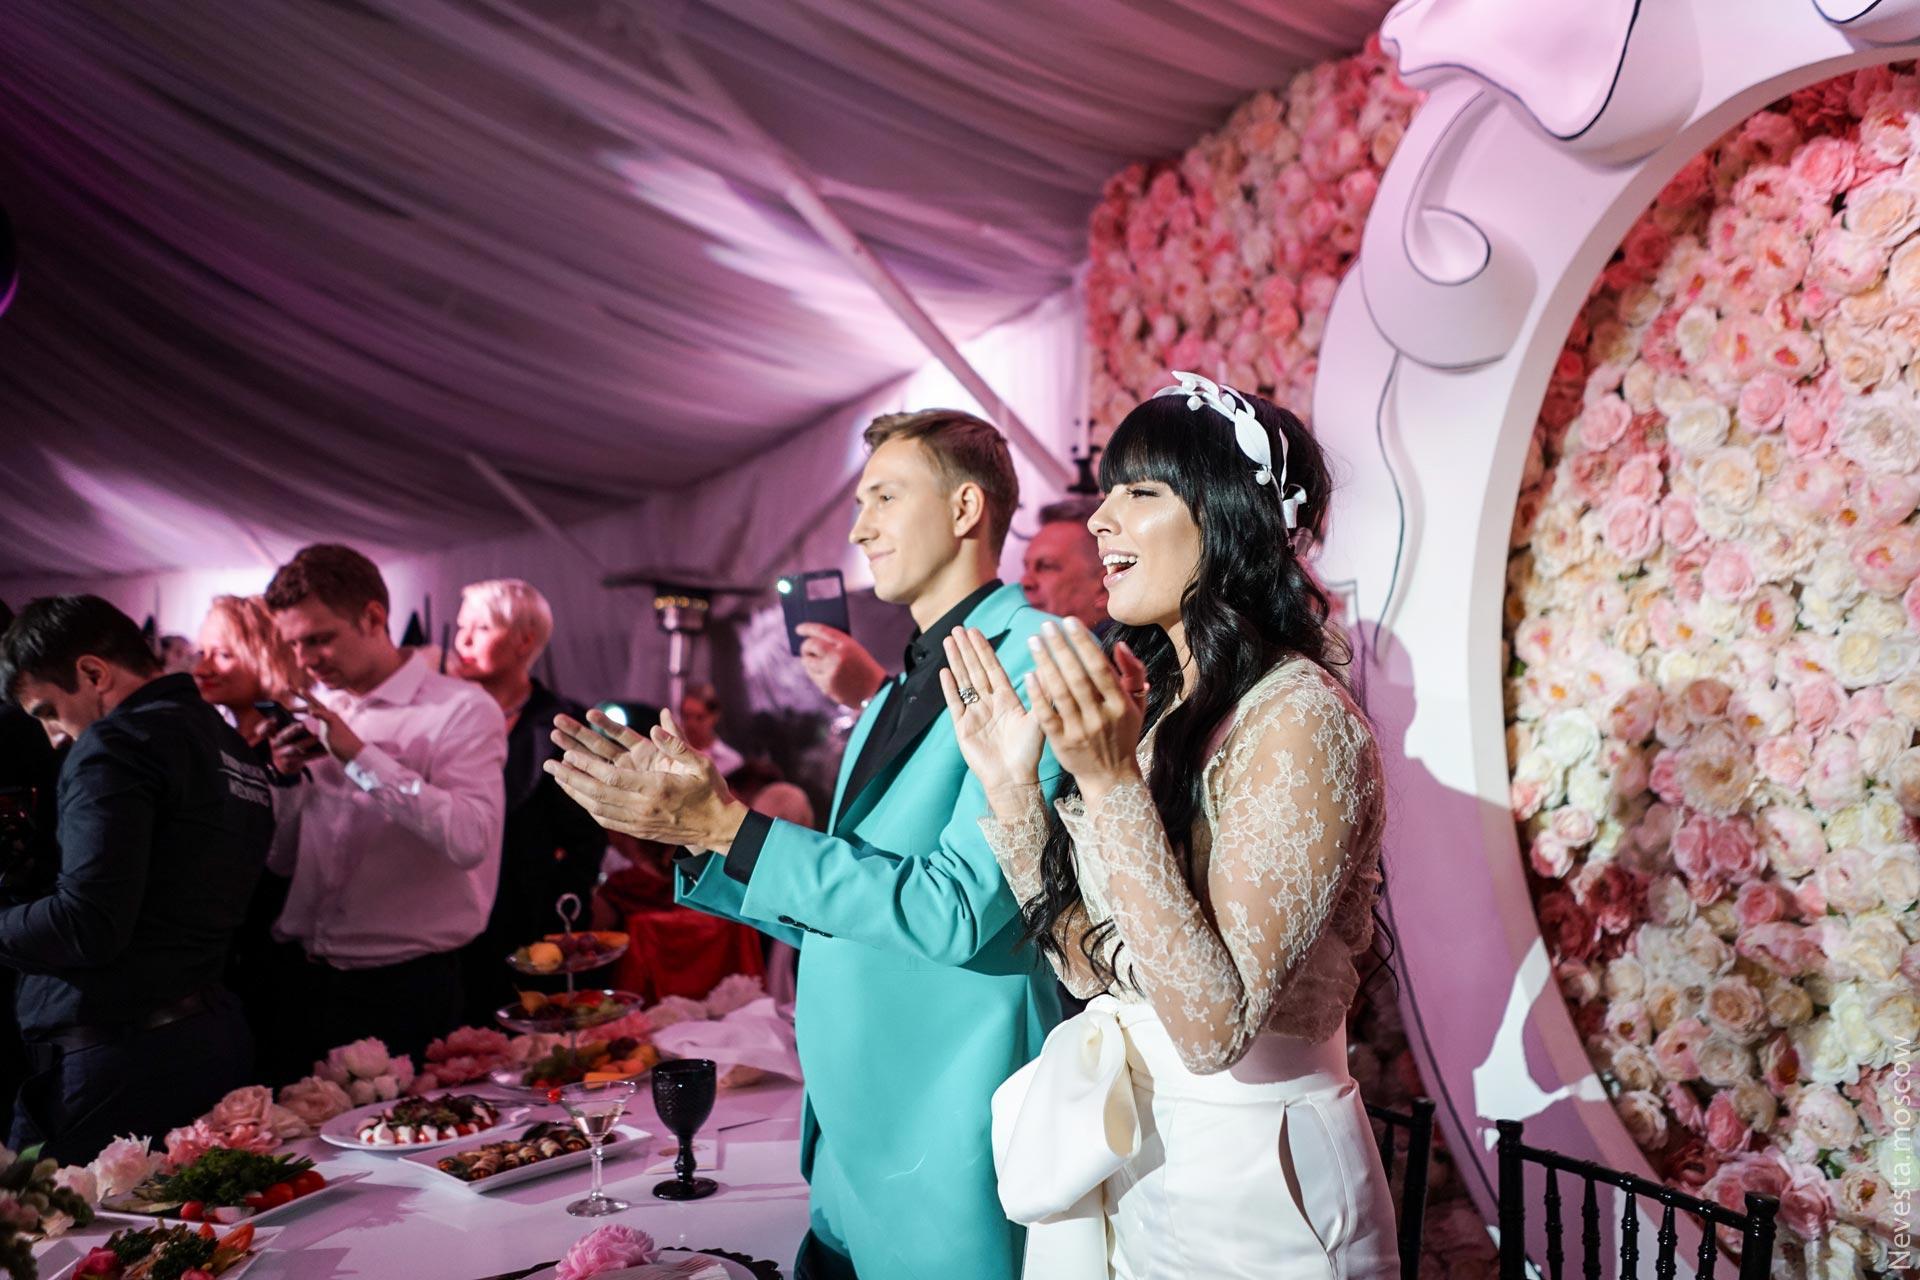 Свадьба Нелли Ермолаевой и Кирилла Андреева фото 49